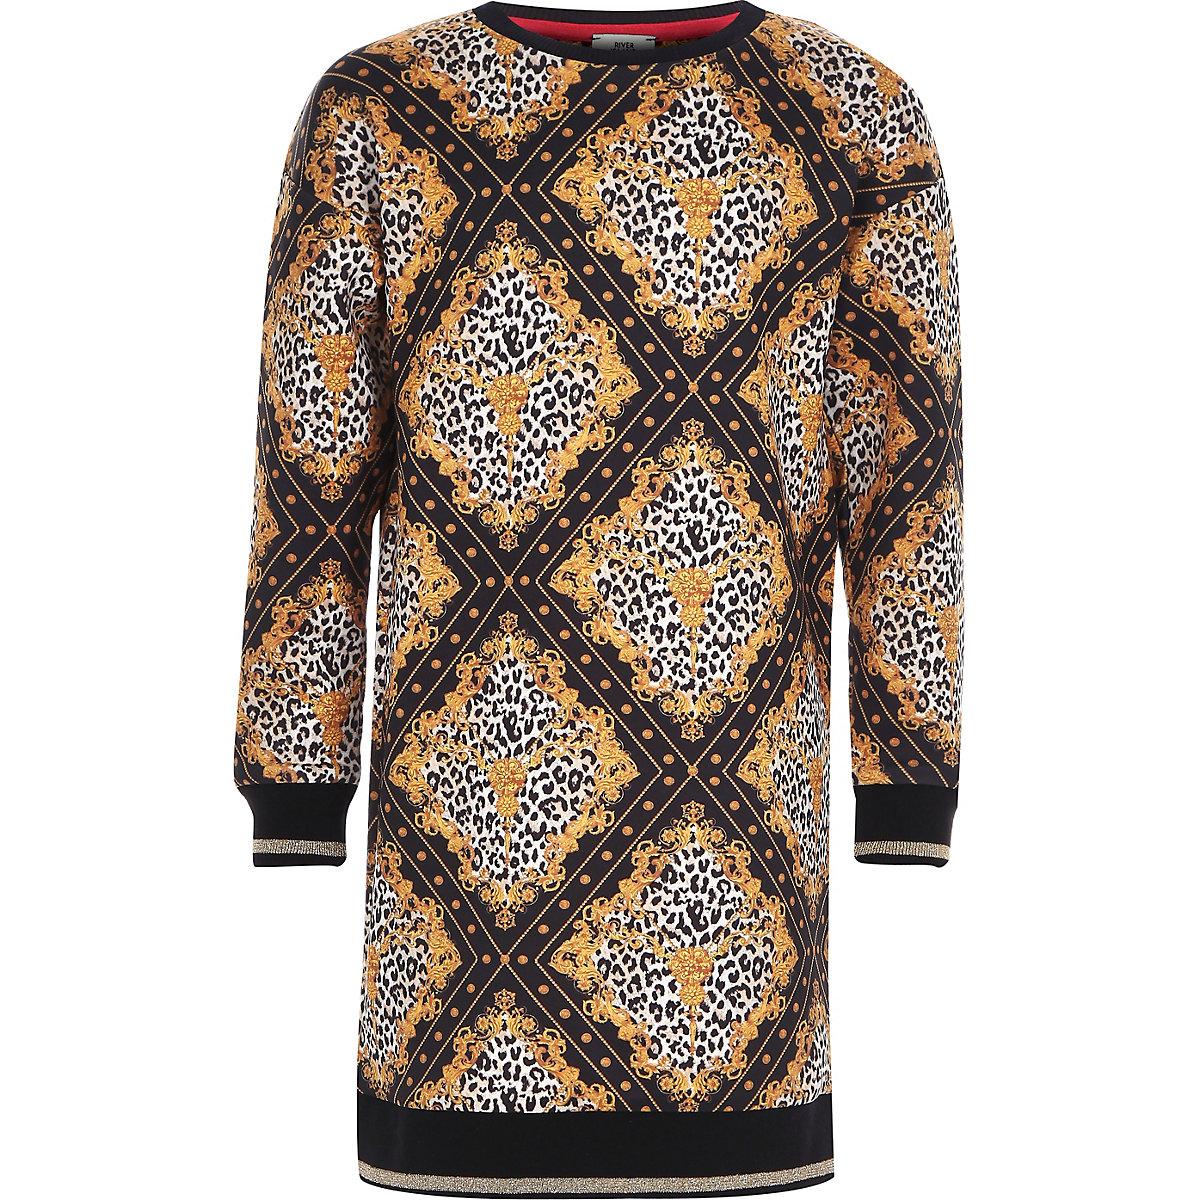 Girls black leopard baroque sweater dress